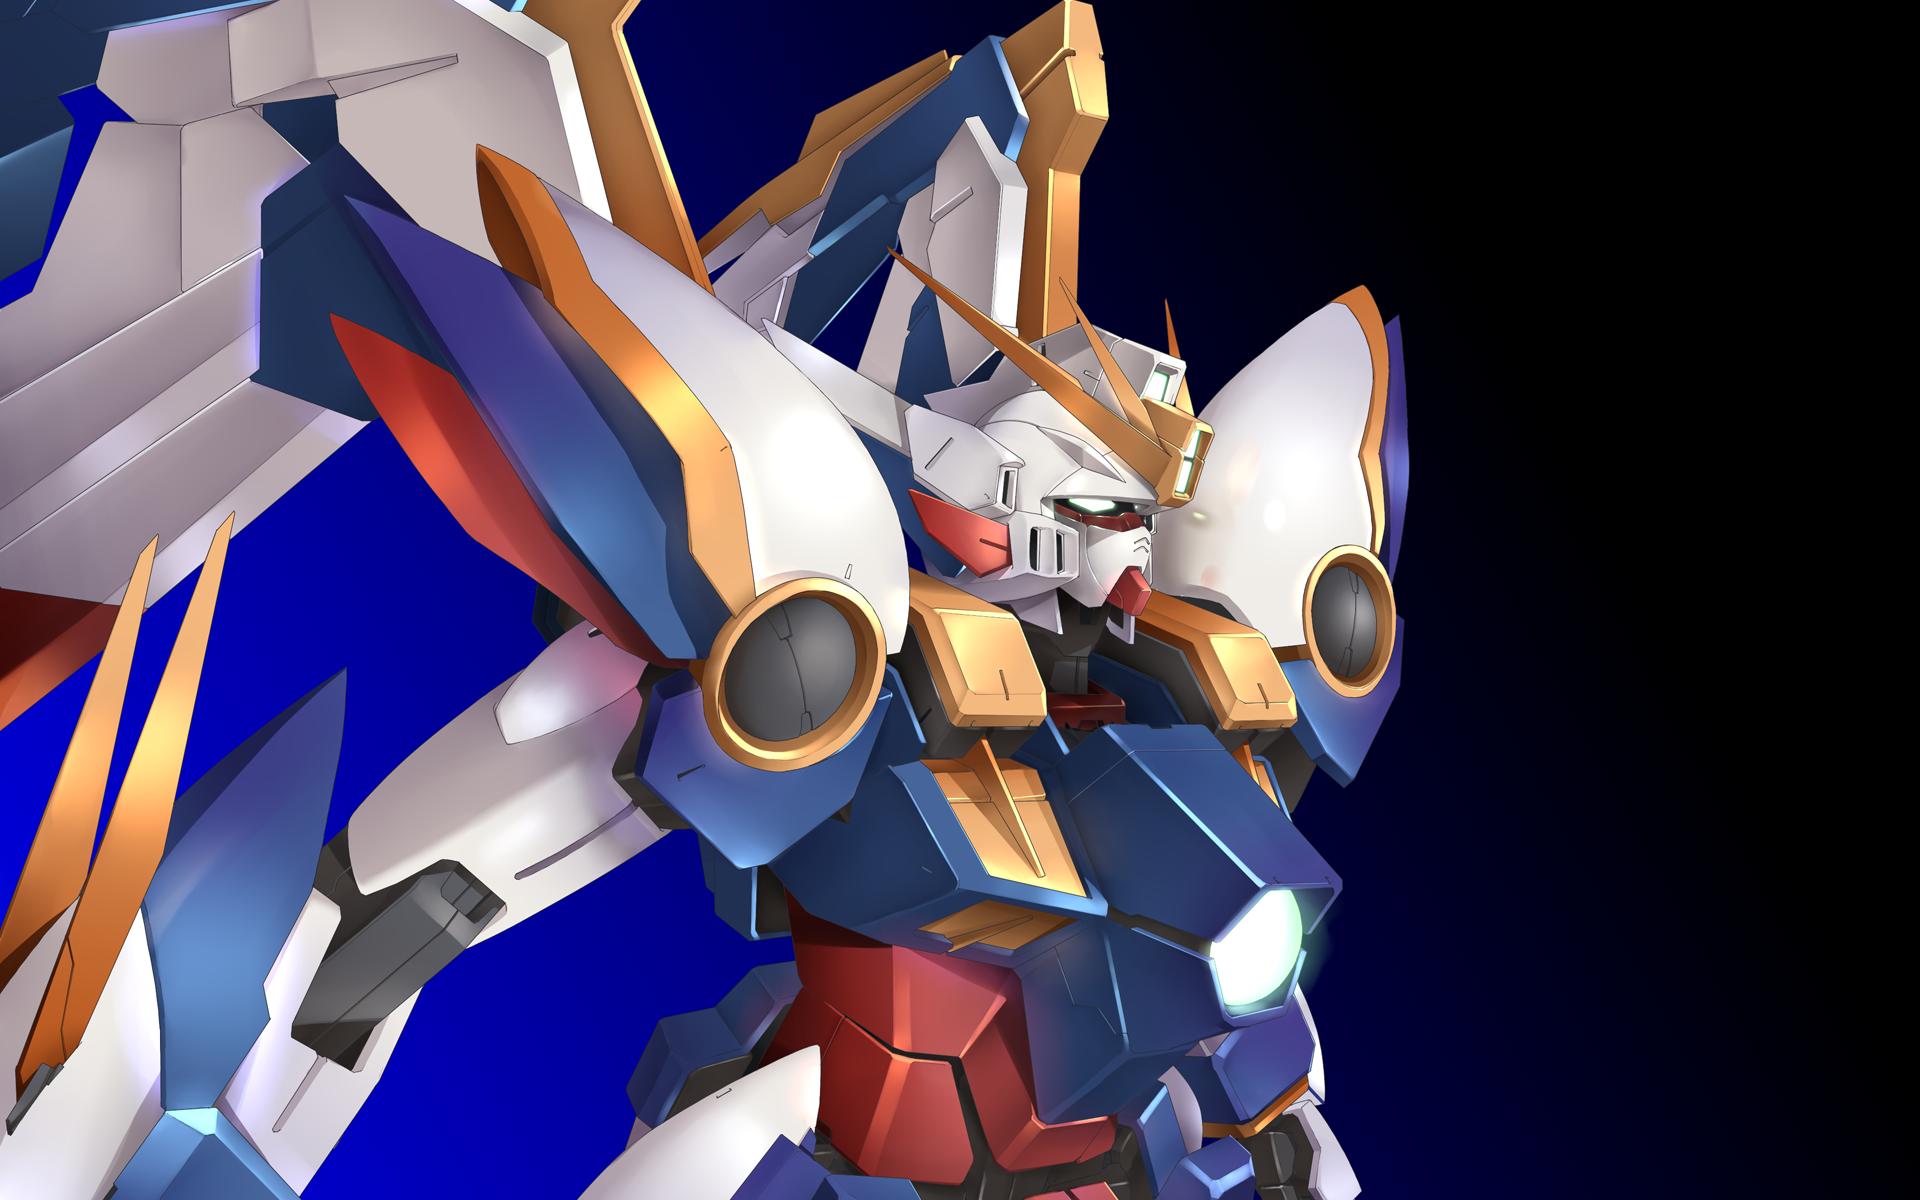 Mobile Suit Gundam Wing Wallpaper 19 HD Desktop Wallpapers 1920x1200